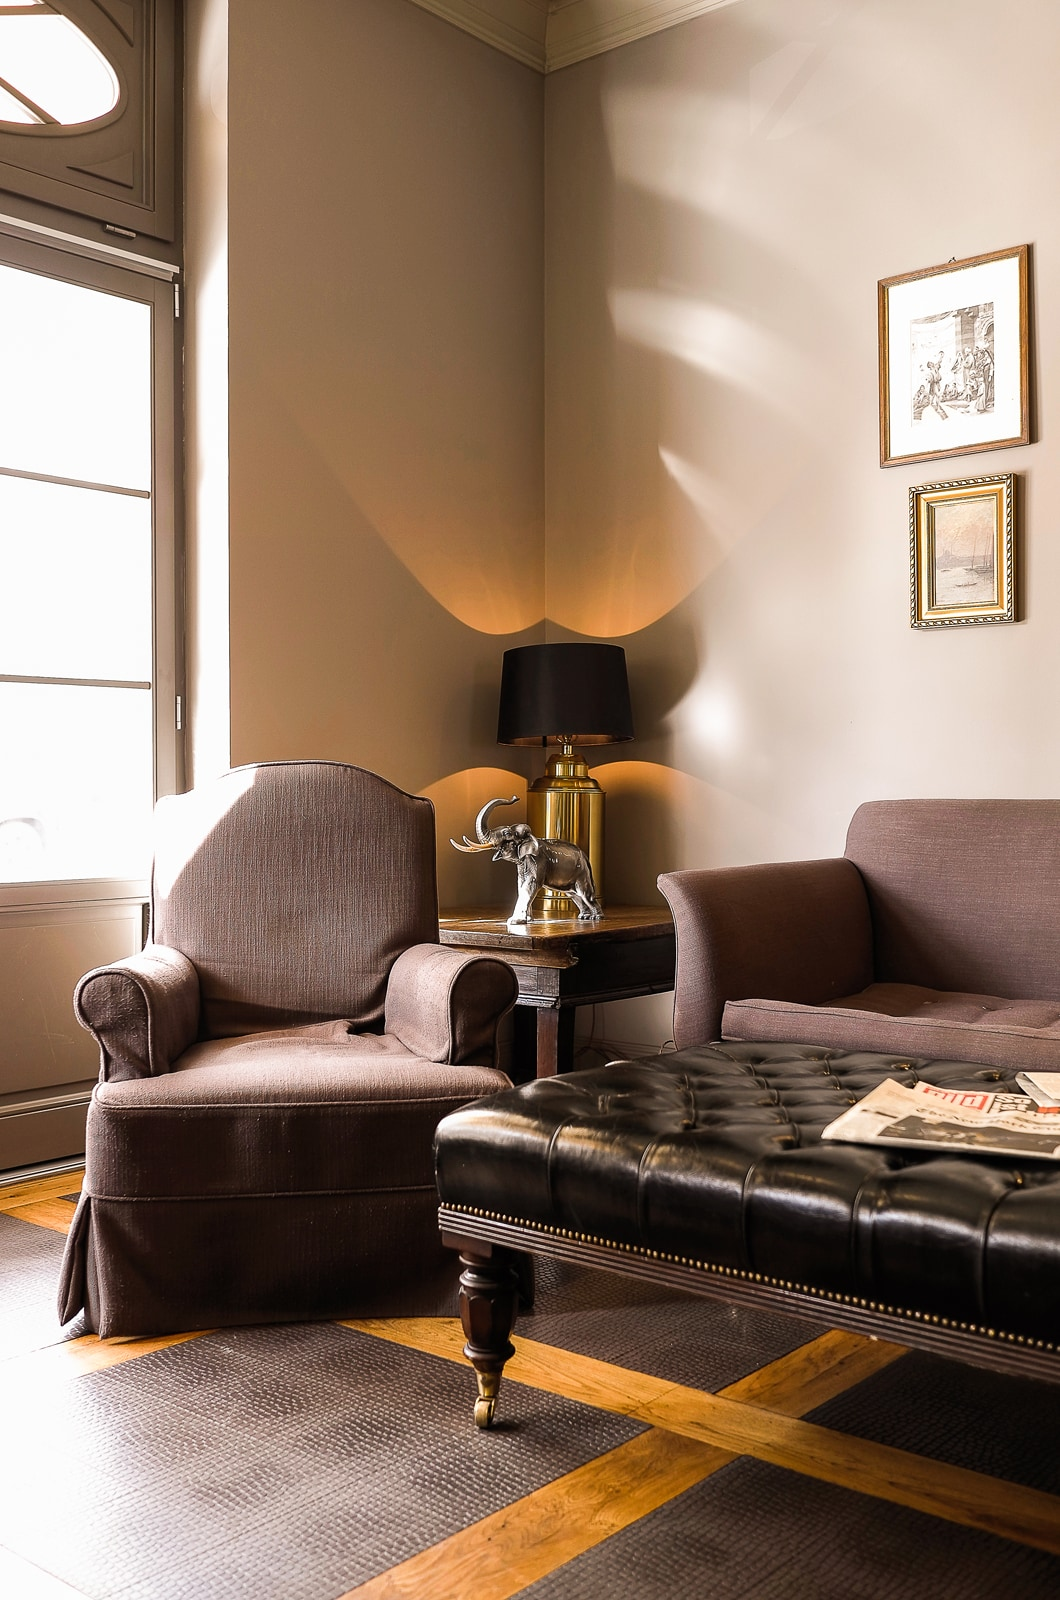 zementfliesen-VIA_zementmosaikplatten-nr.40760-hotel-monbijou-02-viaplatten | 40760